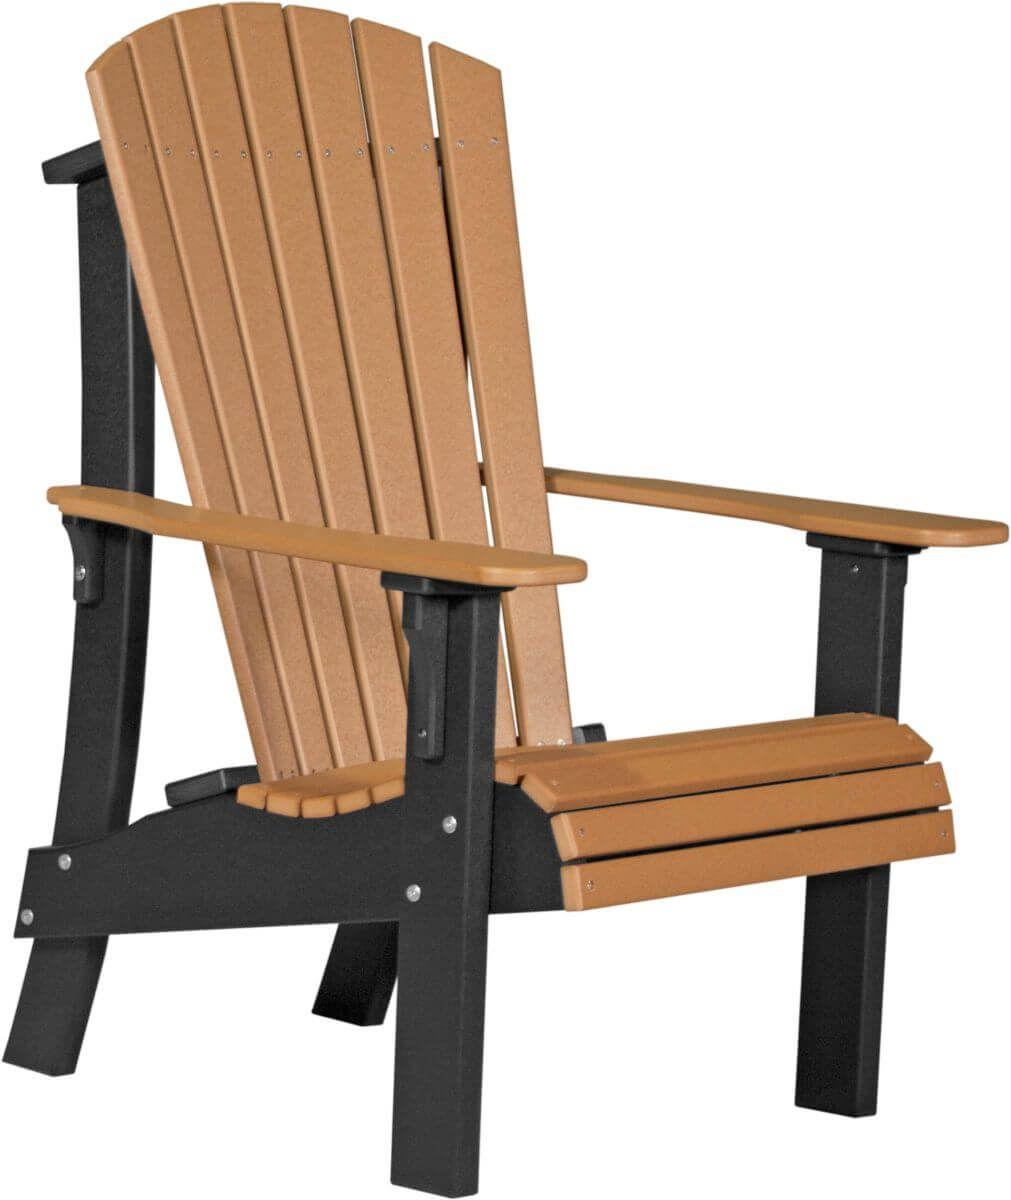 Cedar and Black Rockaway Highback Adirondack Chair